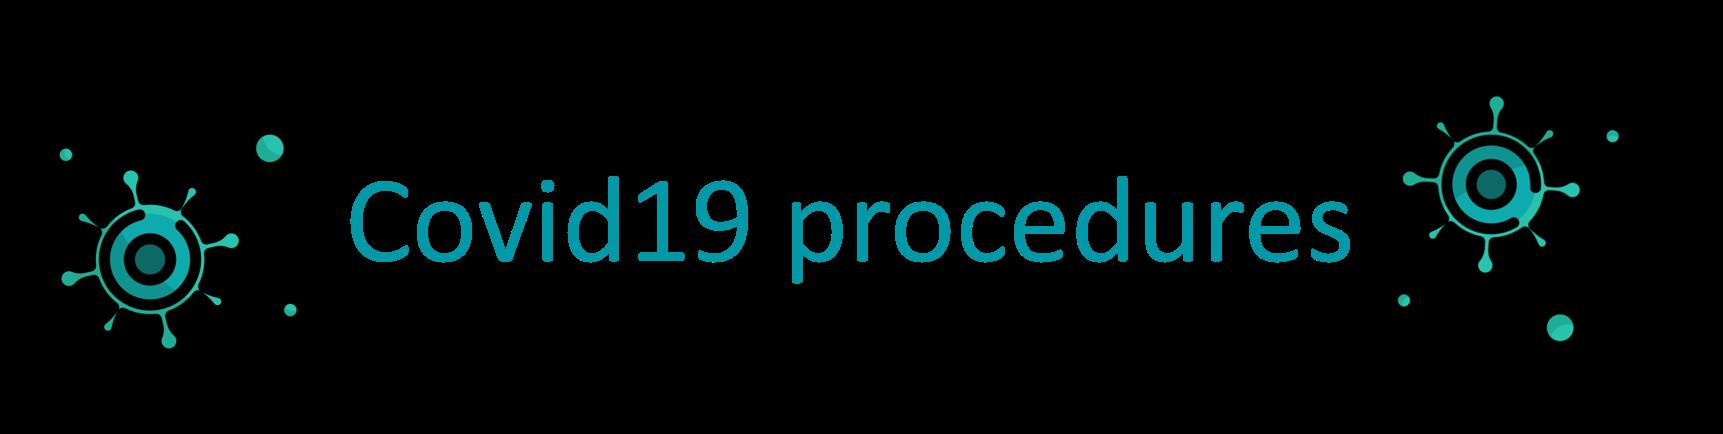 Covid19: SortMySpace's procedures for Coronavirus